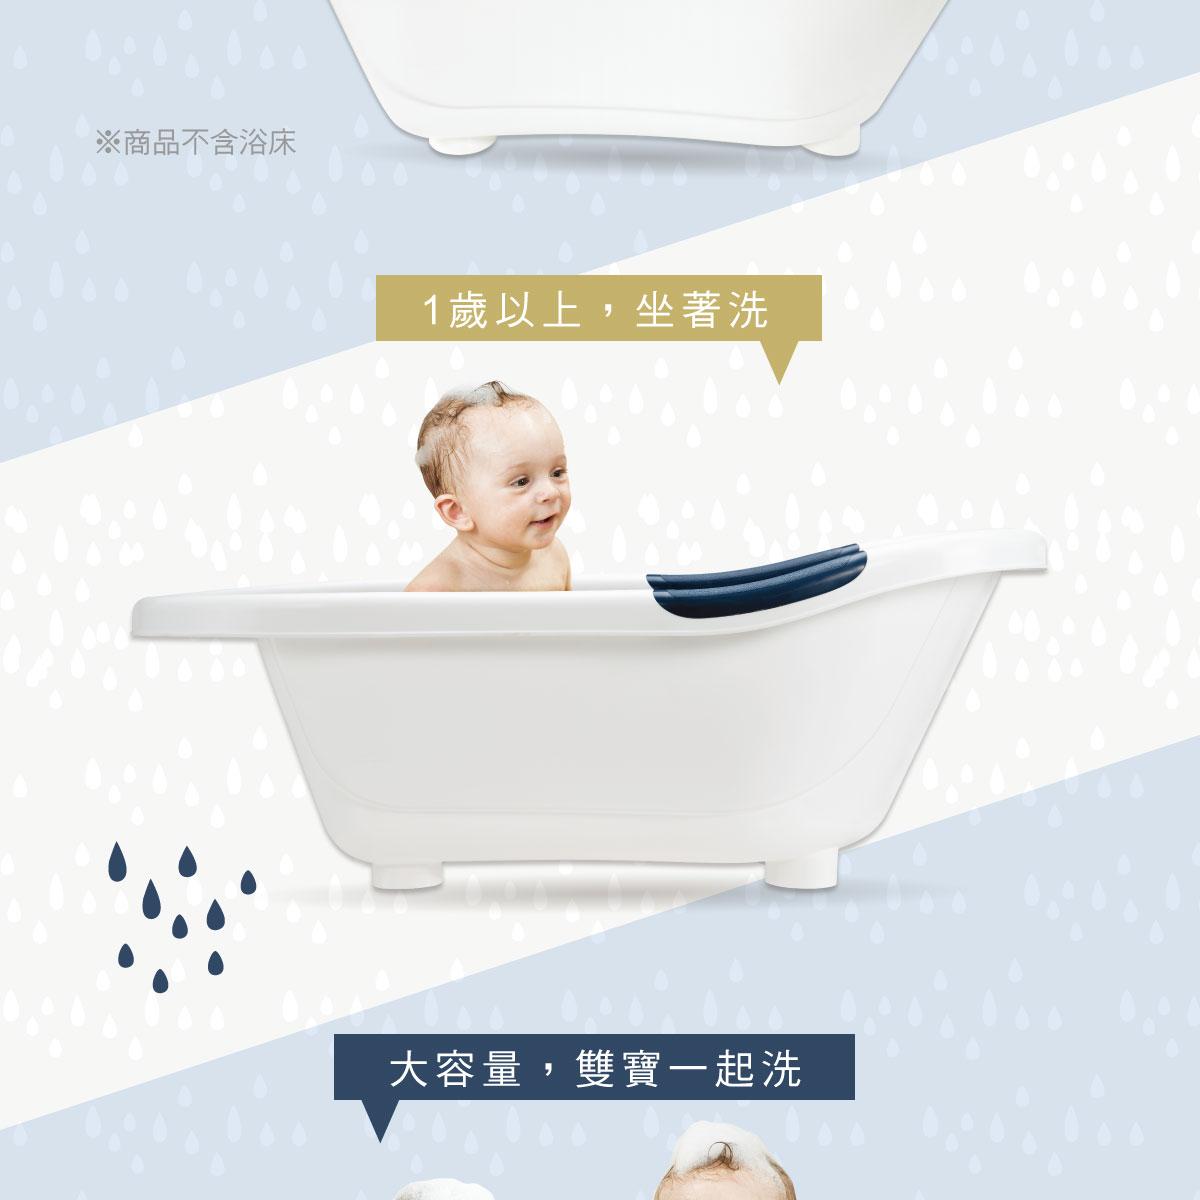 proimages/Bathing&CleanSeries/Bathing/BabyBathTub/1135/1135-成長印記浴盆-EDM-4.jpg